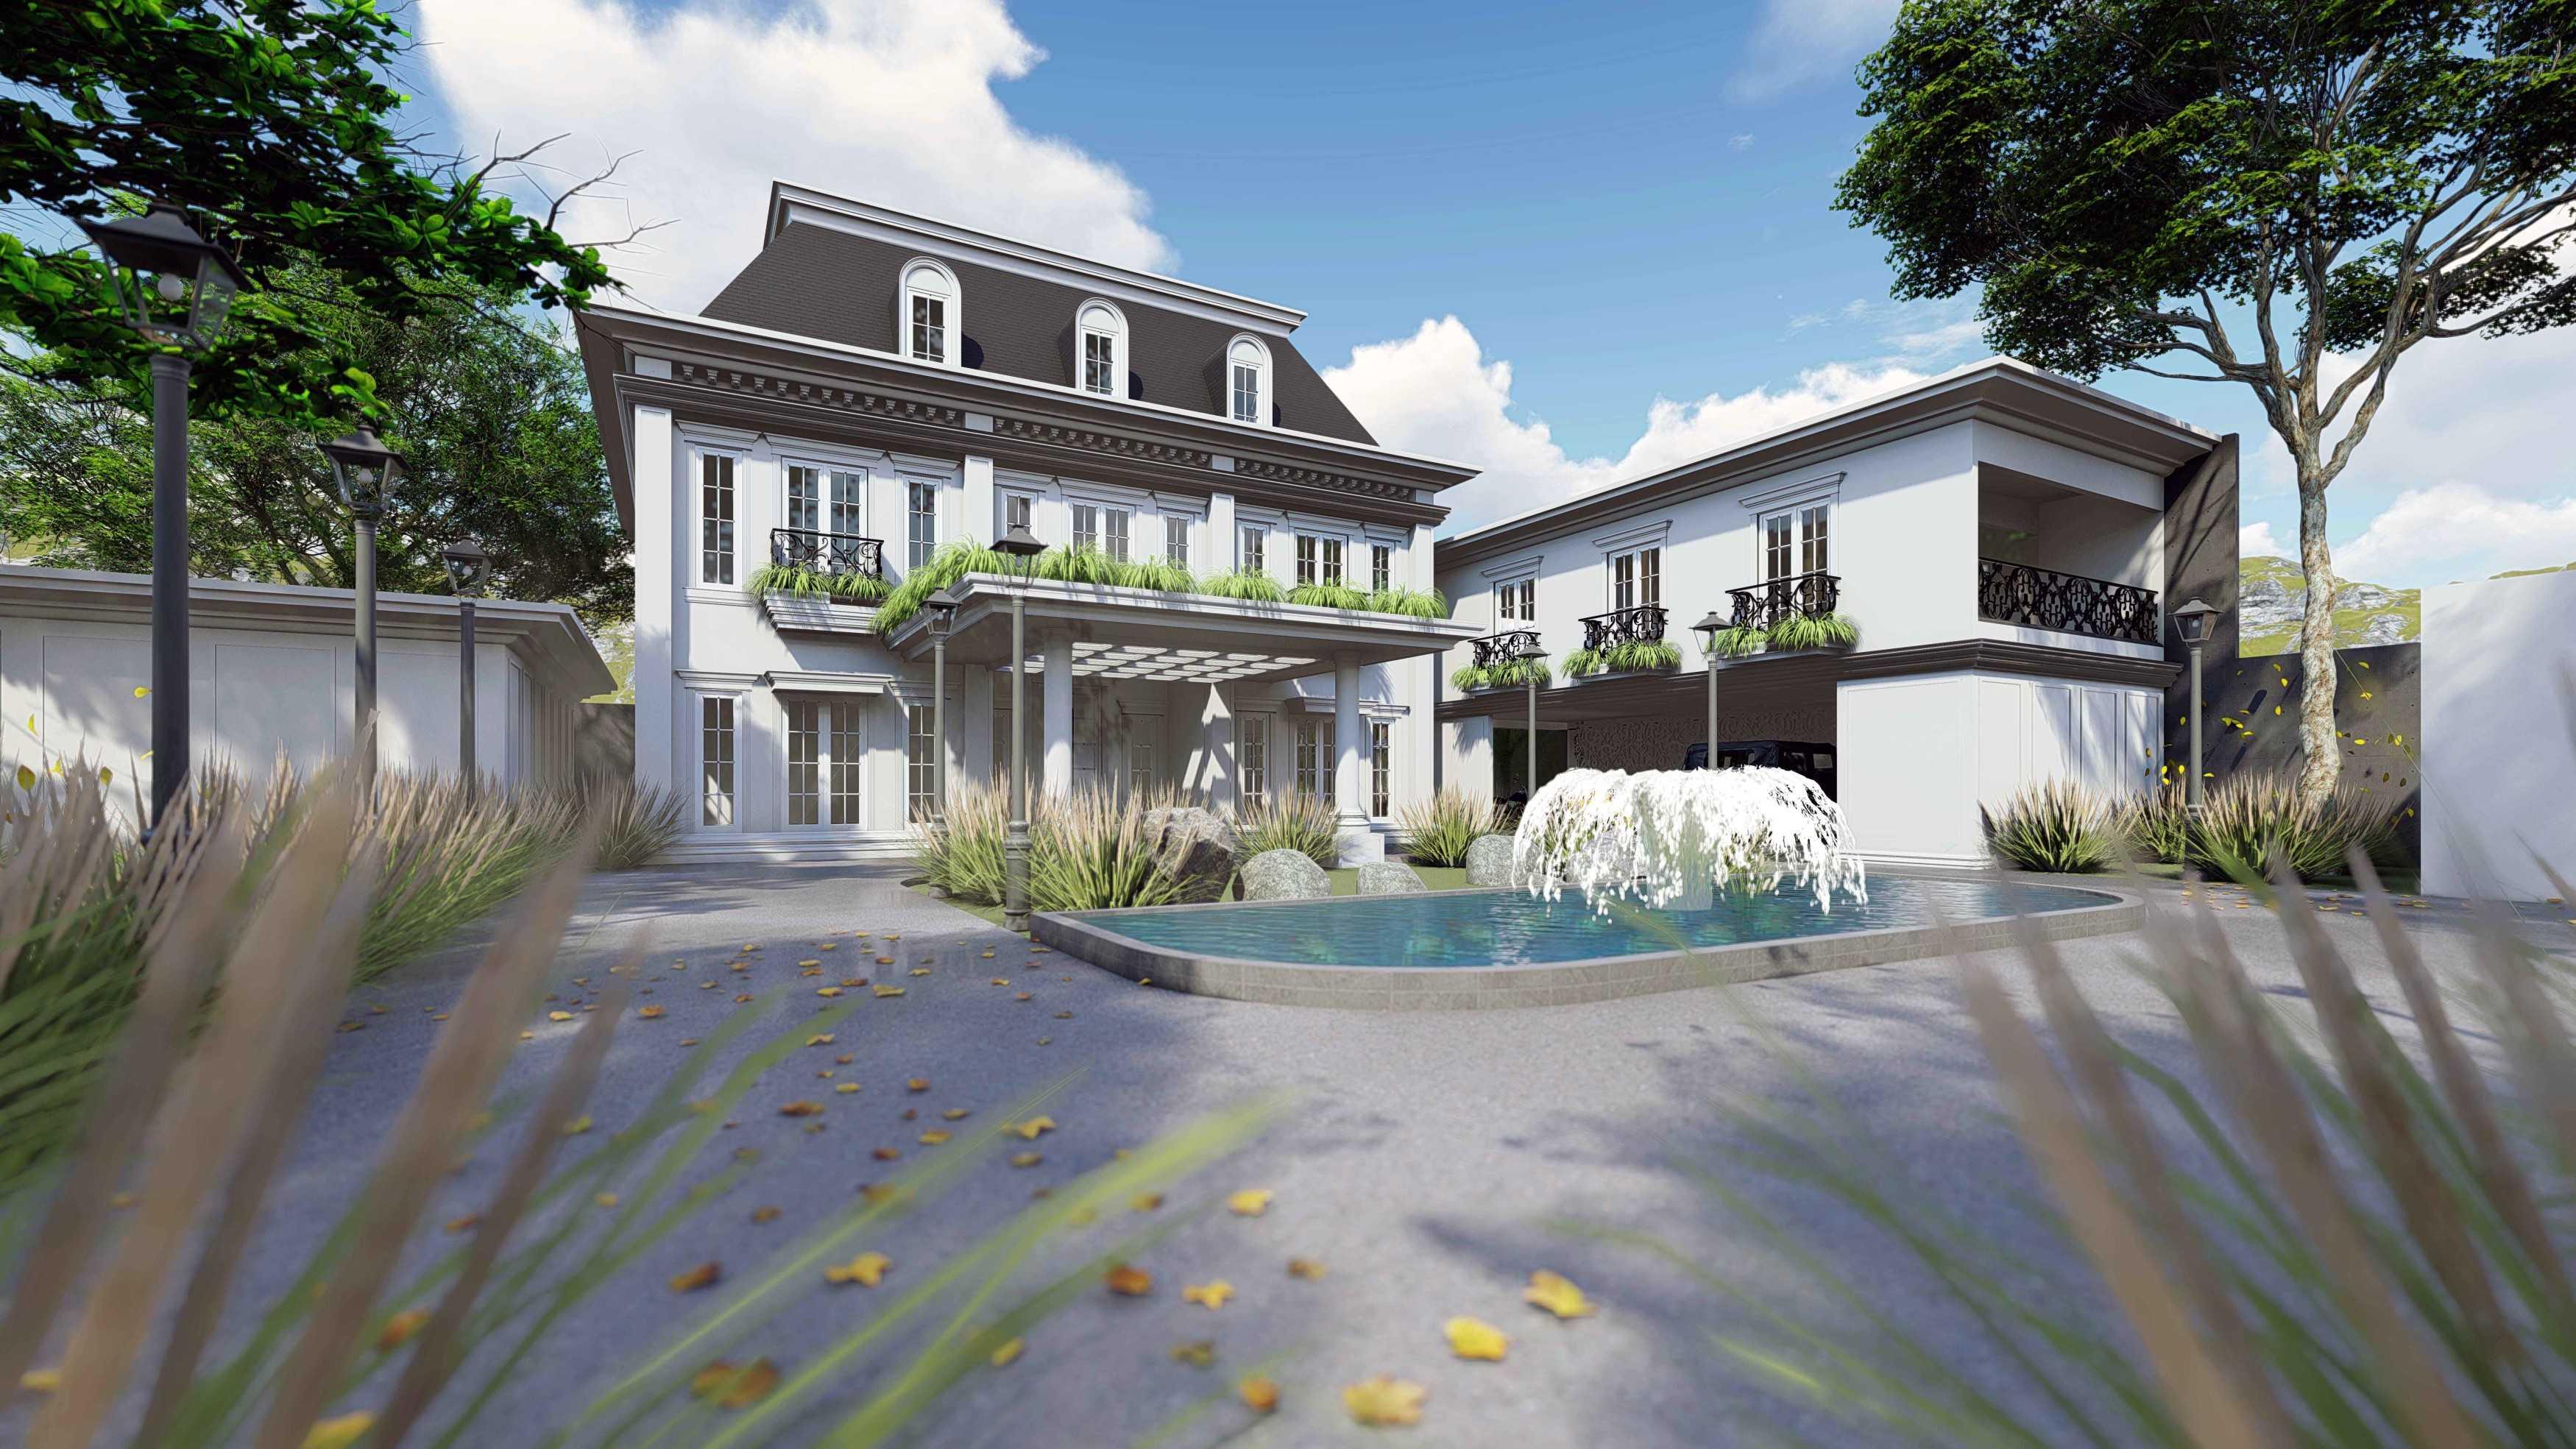 Mahastudio & Partner Hidden Palace House Bogor, Jawa Barat, Indonesia Bogor, Jawa Barat, Indonesia Mahastudio-Partner-Hidden-Palace-House   55935